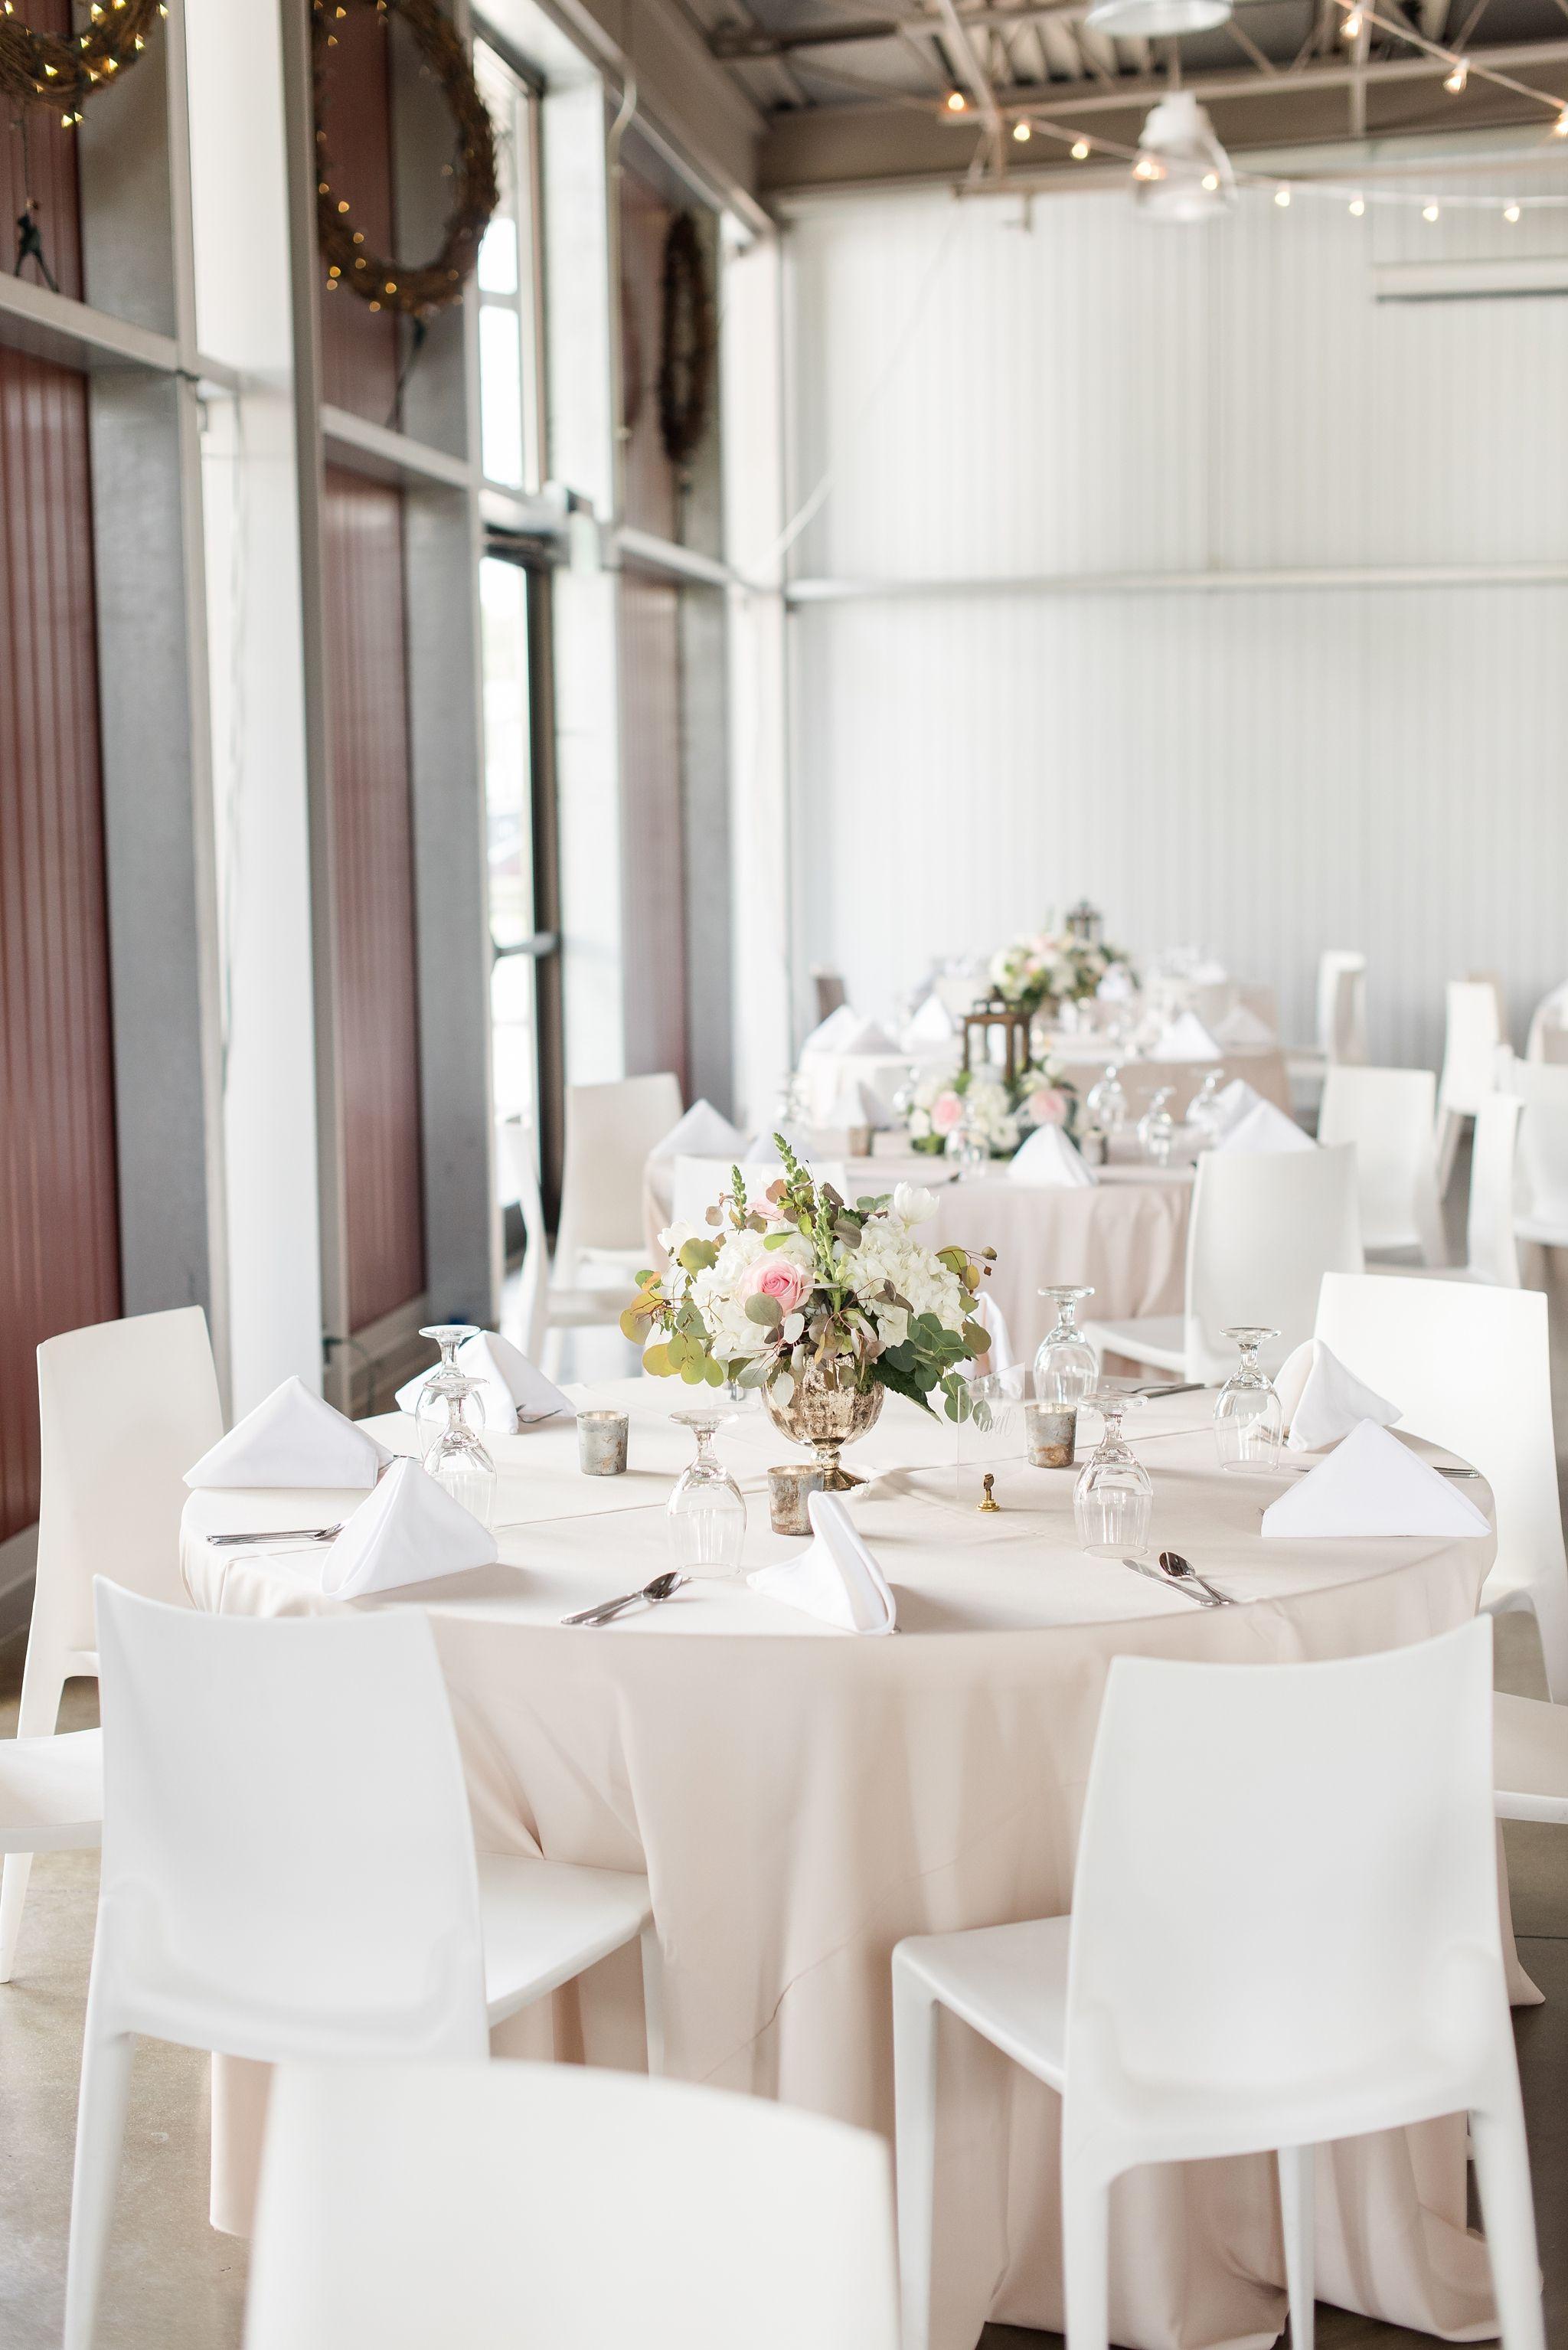 Jasper Winery Wedding White Willow Events Wedding Katie Lindgren Photography Des Moines Iowa Summer Wedding Reception Des Moines Wedding Event Planning